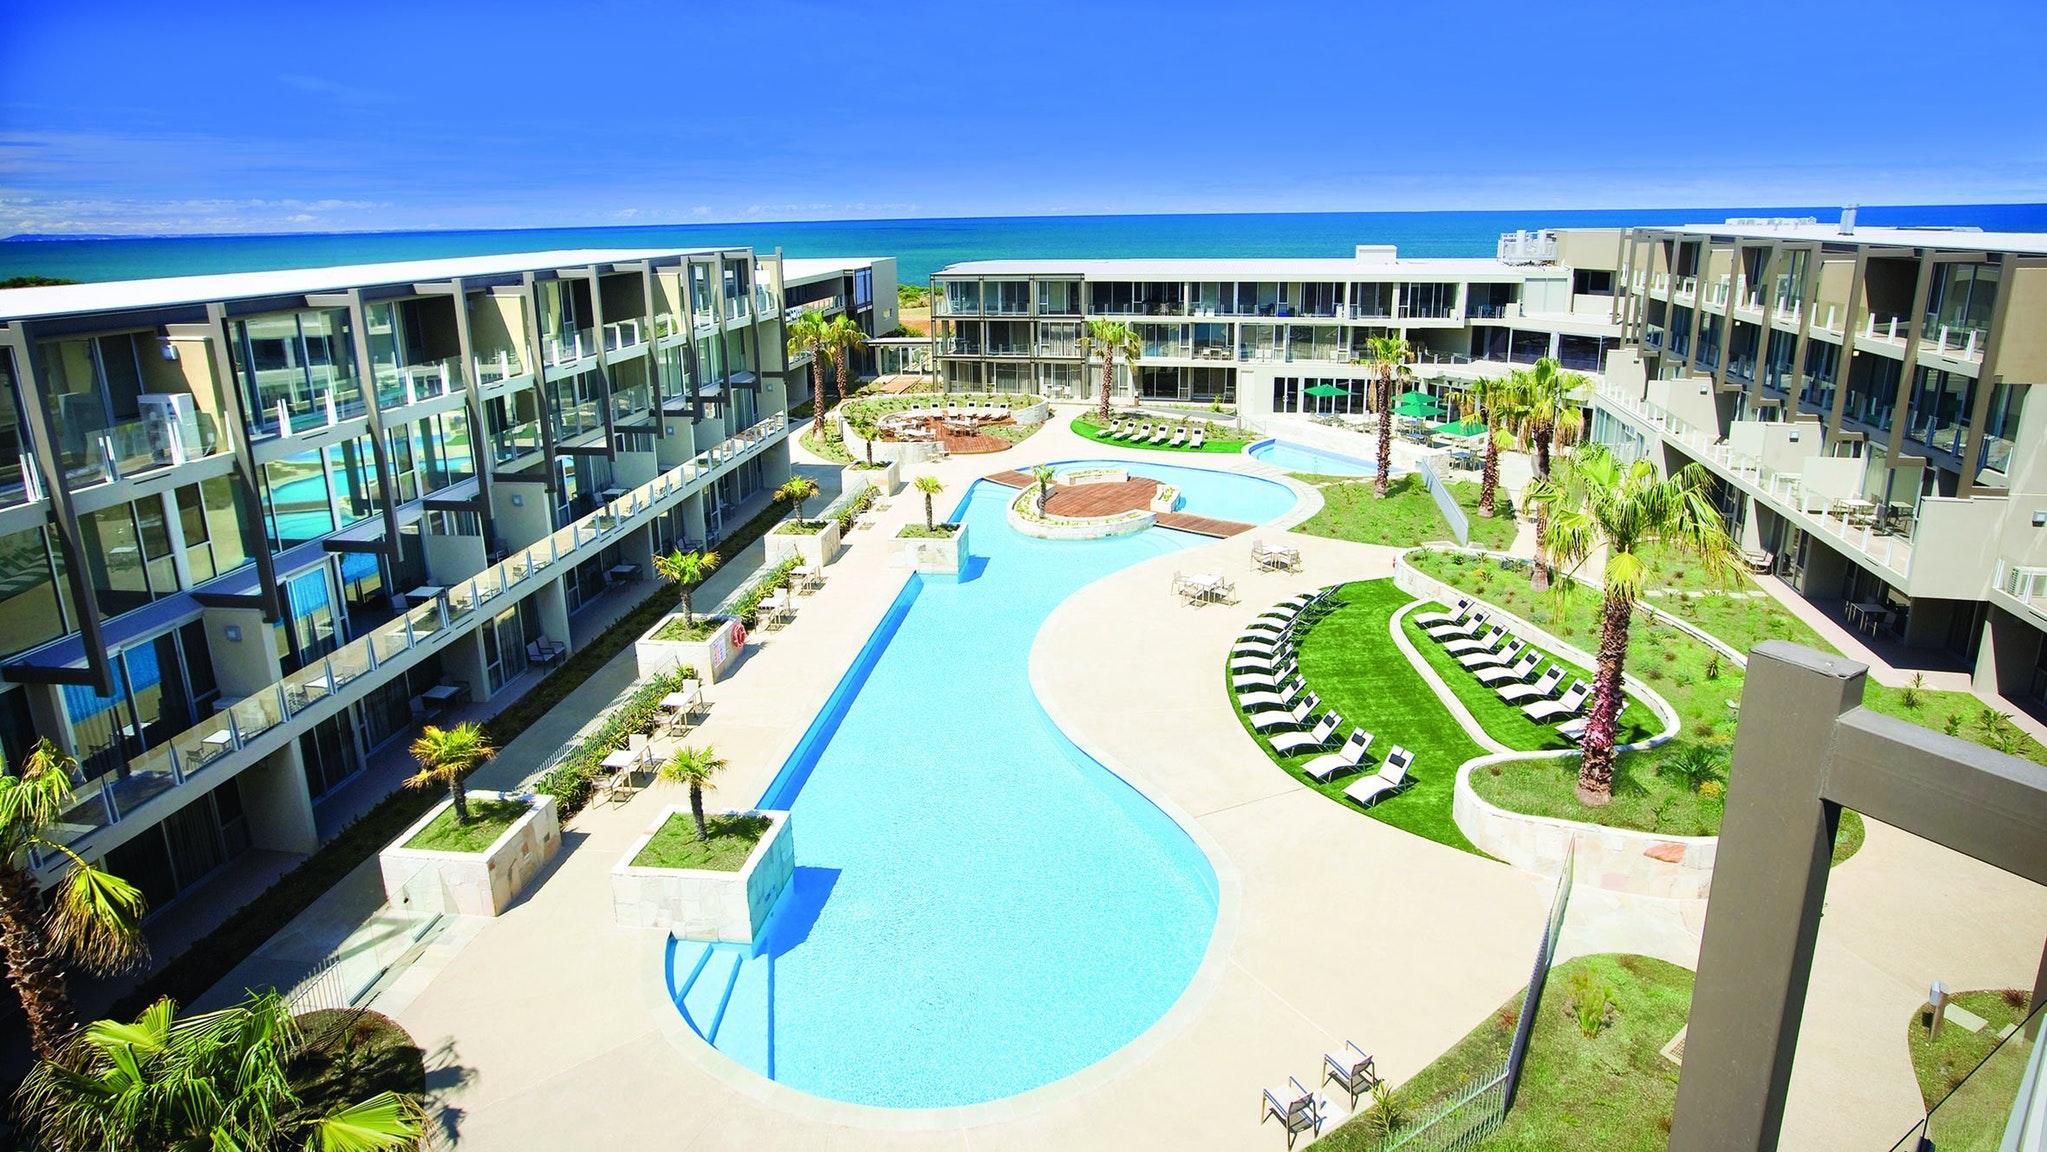 The Bay Hotel Torquay